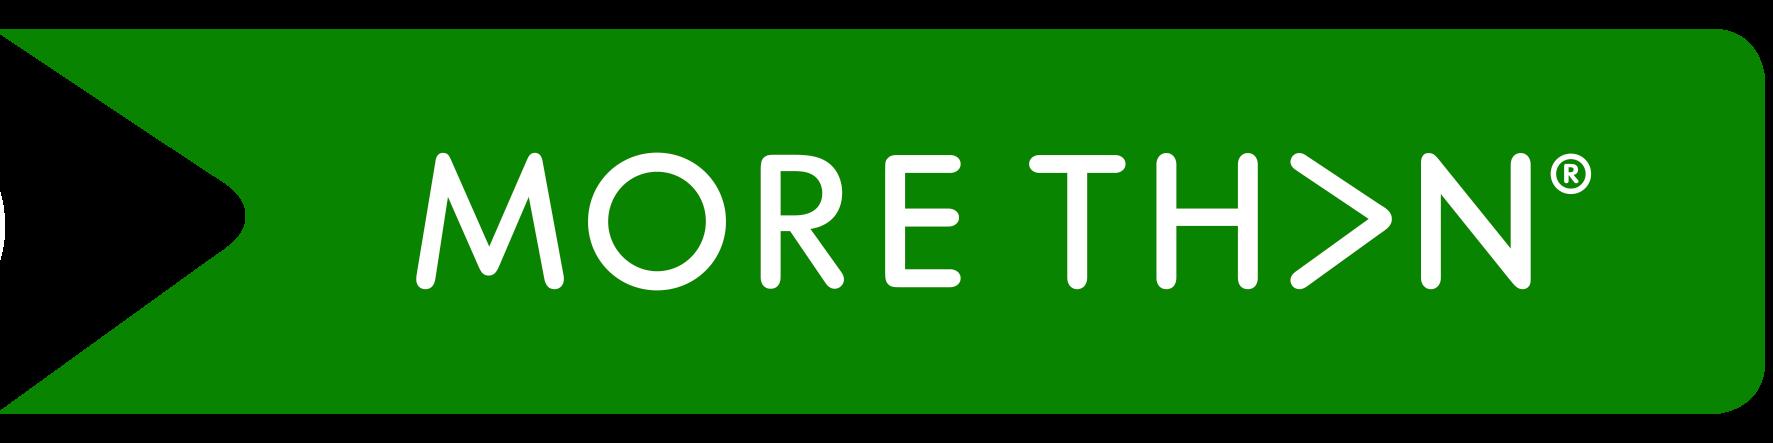 More Than Car Insurance logo